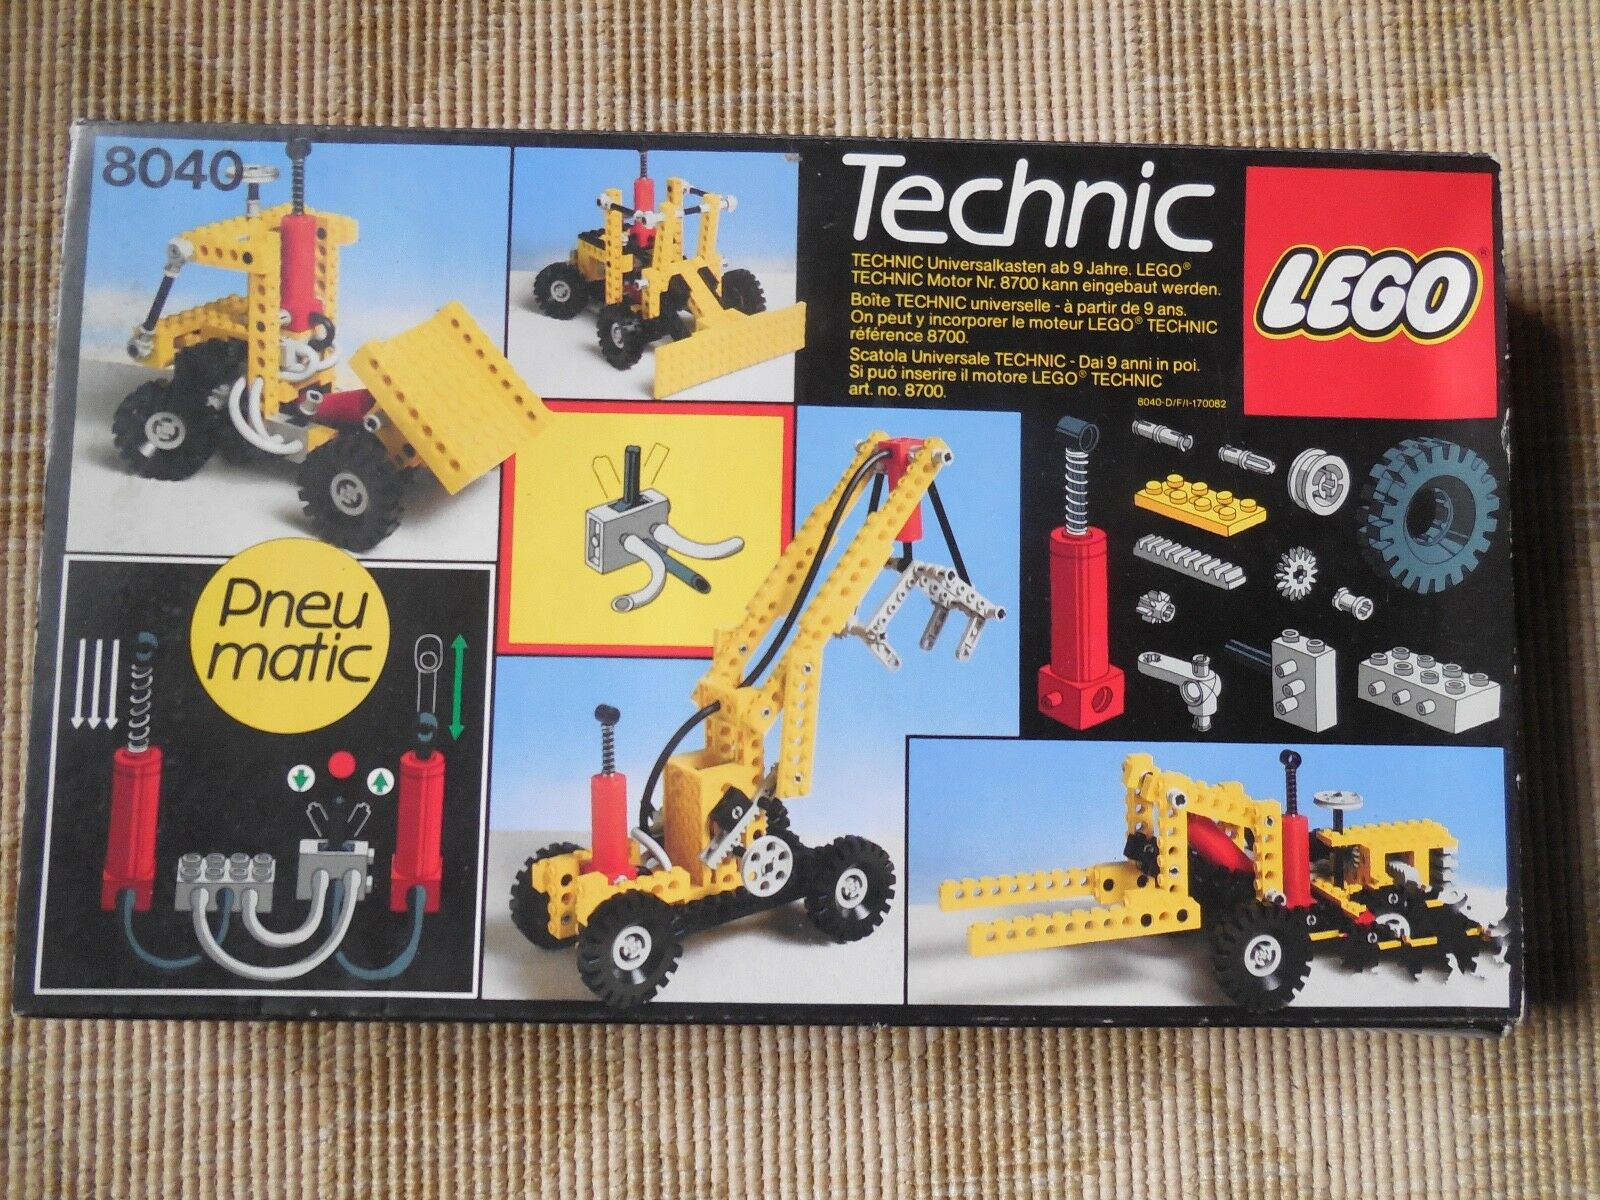 Lego Technic Set 8040 Pneumatic Truck